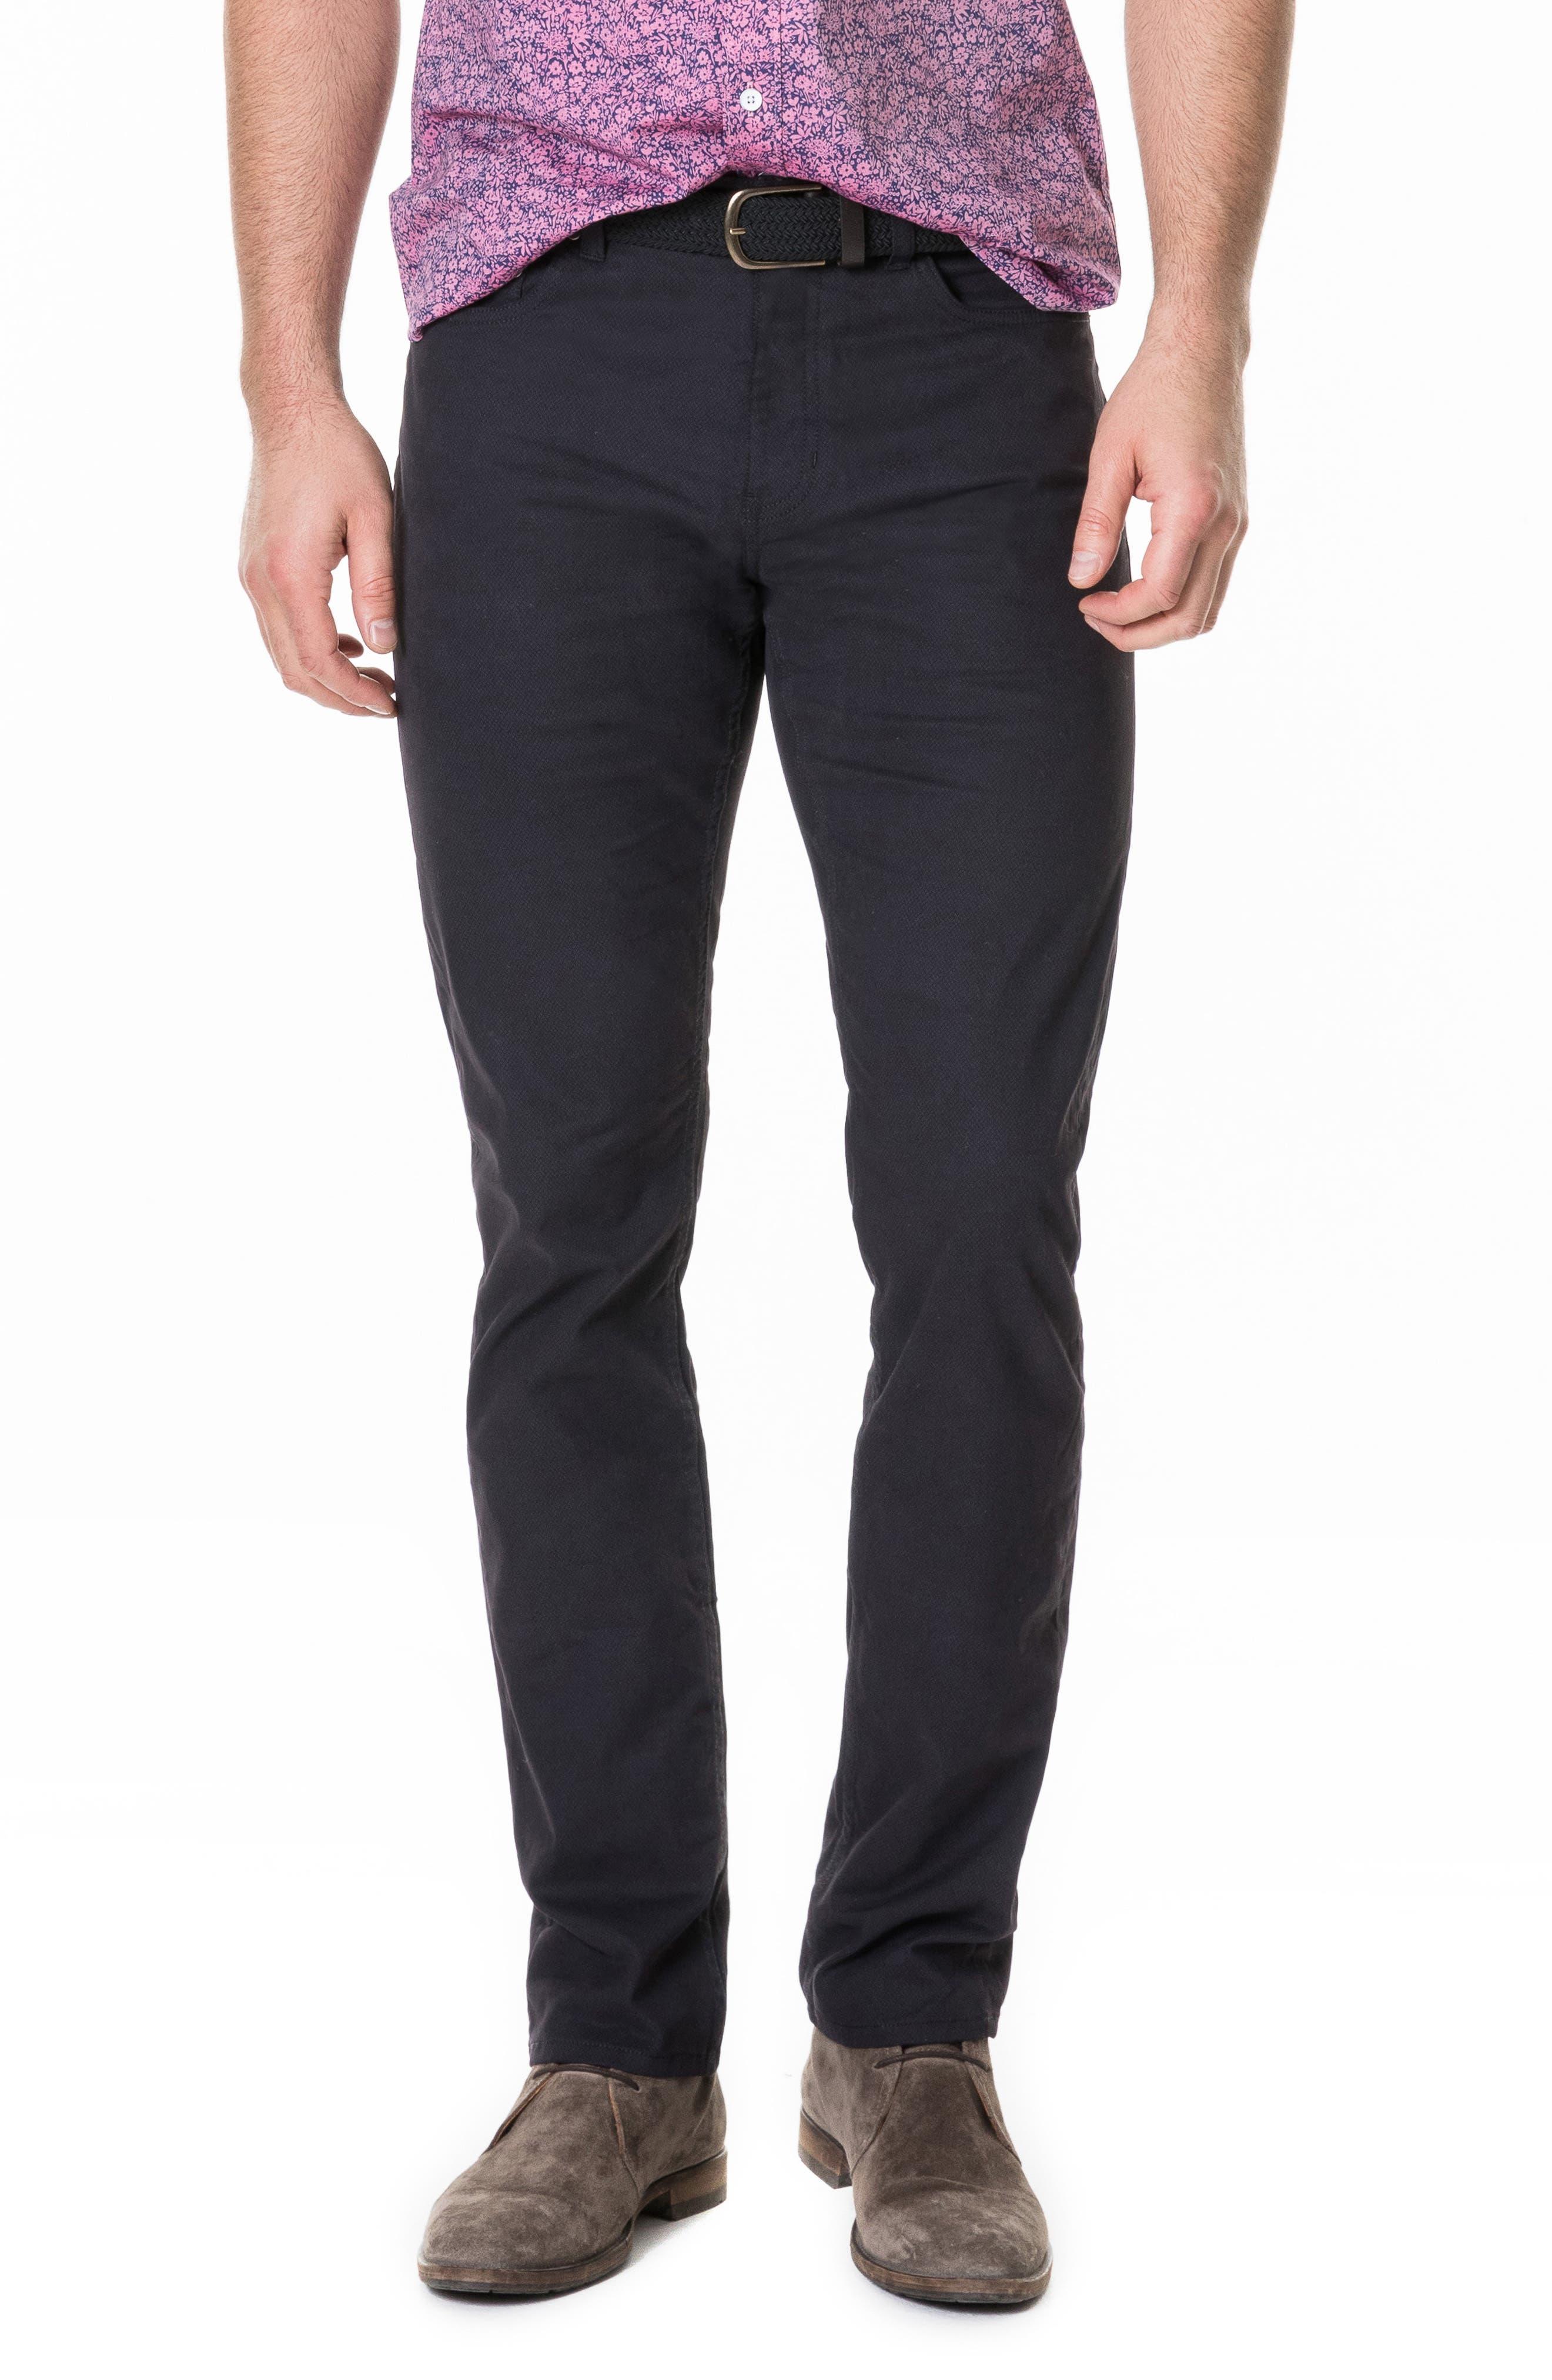 Whareflat Straight Leg Jeans,                             Main thumbnail 1, color,                             ASPHALT